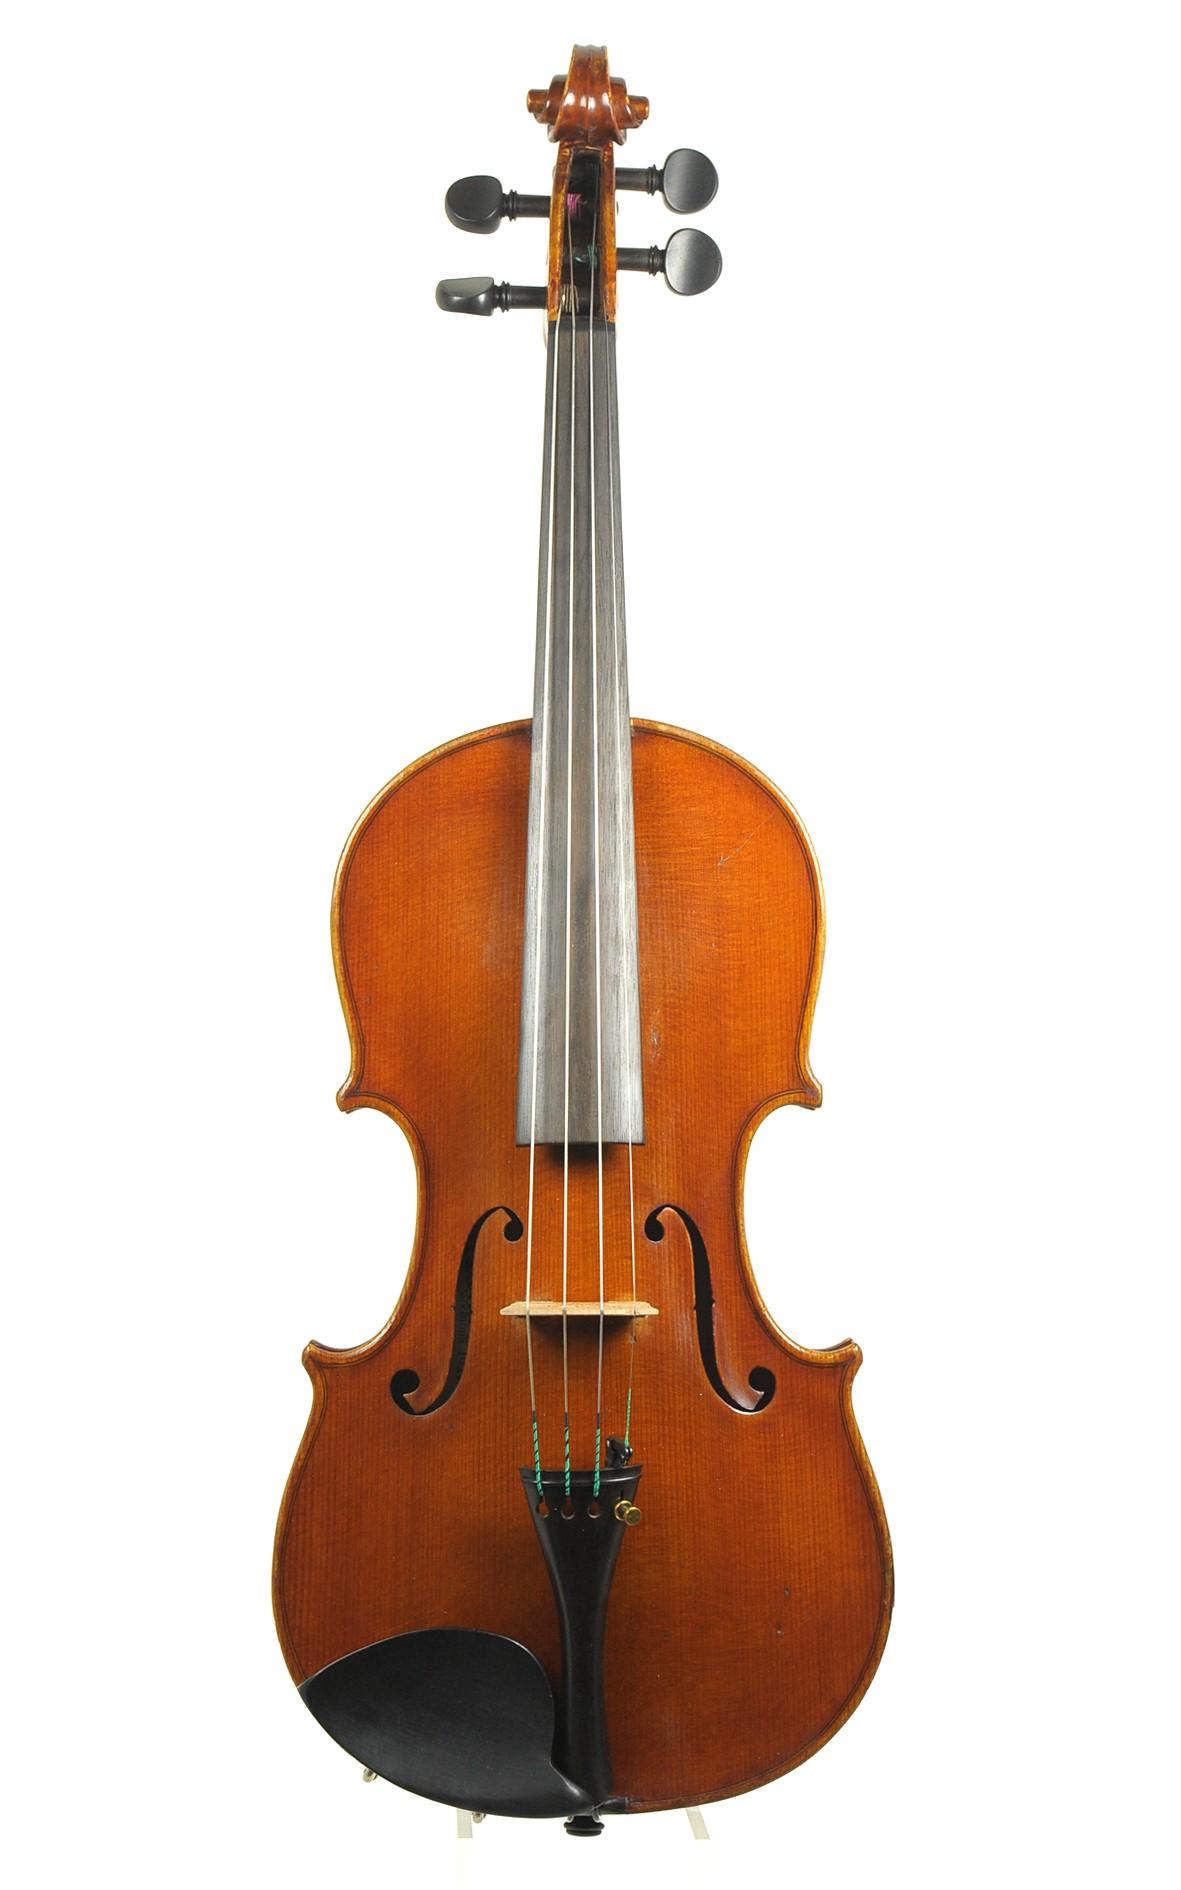 Italian violin, Officina Claudio Monteverde, Cremona, 1923